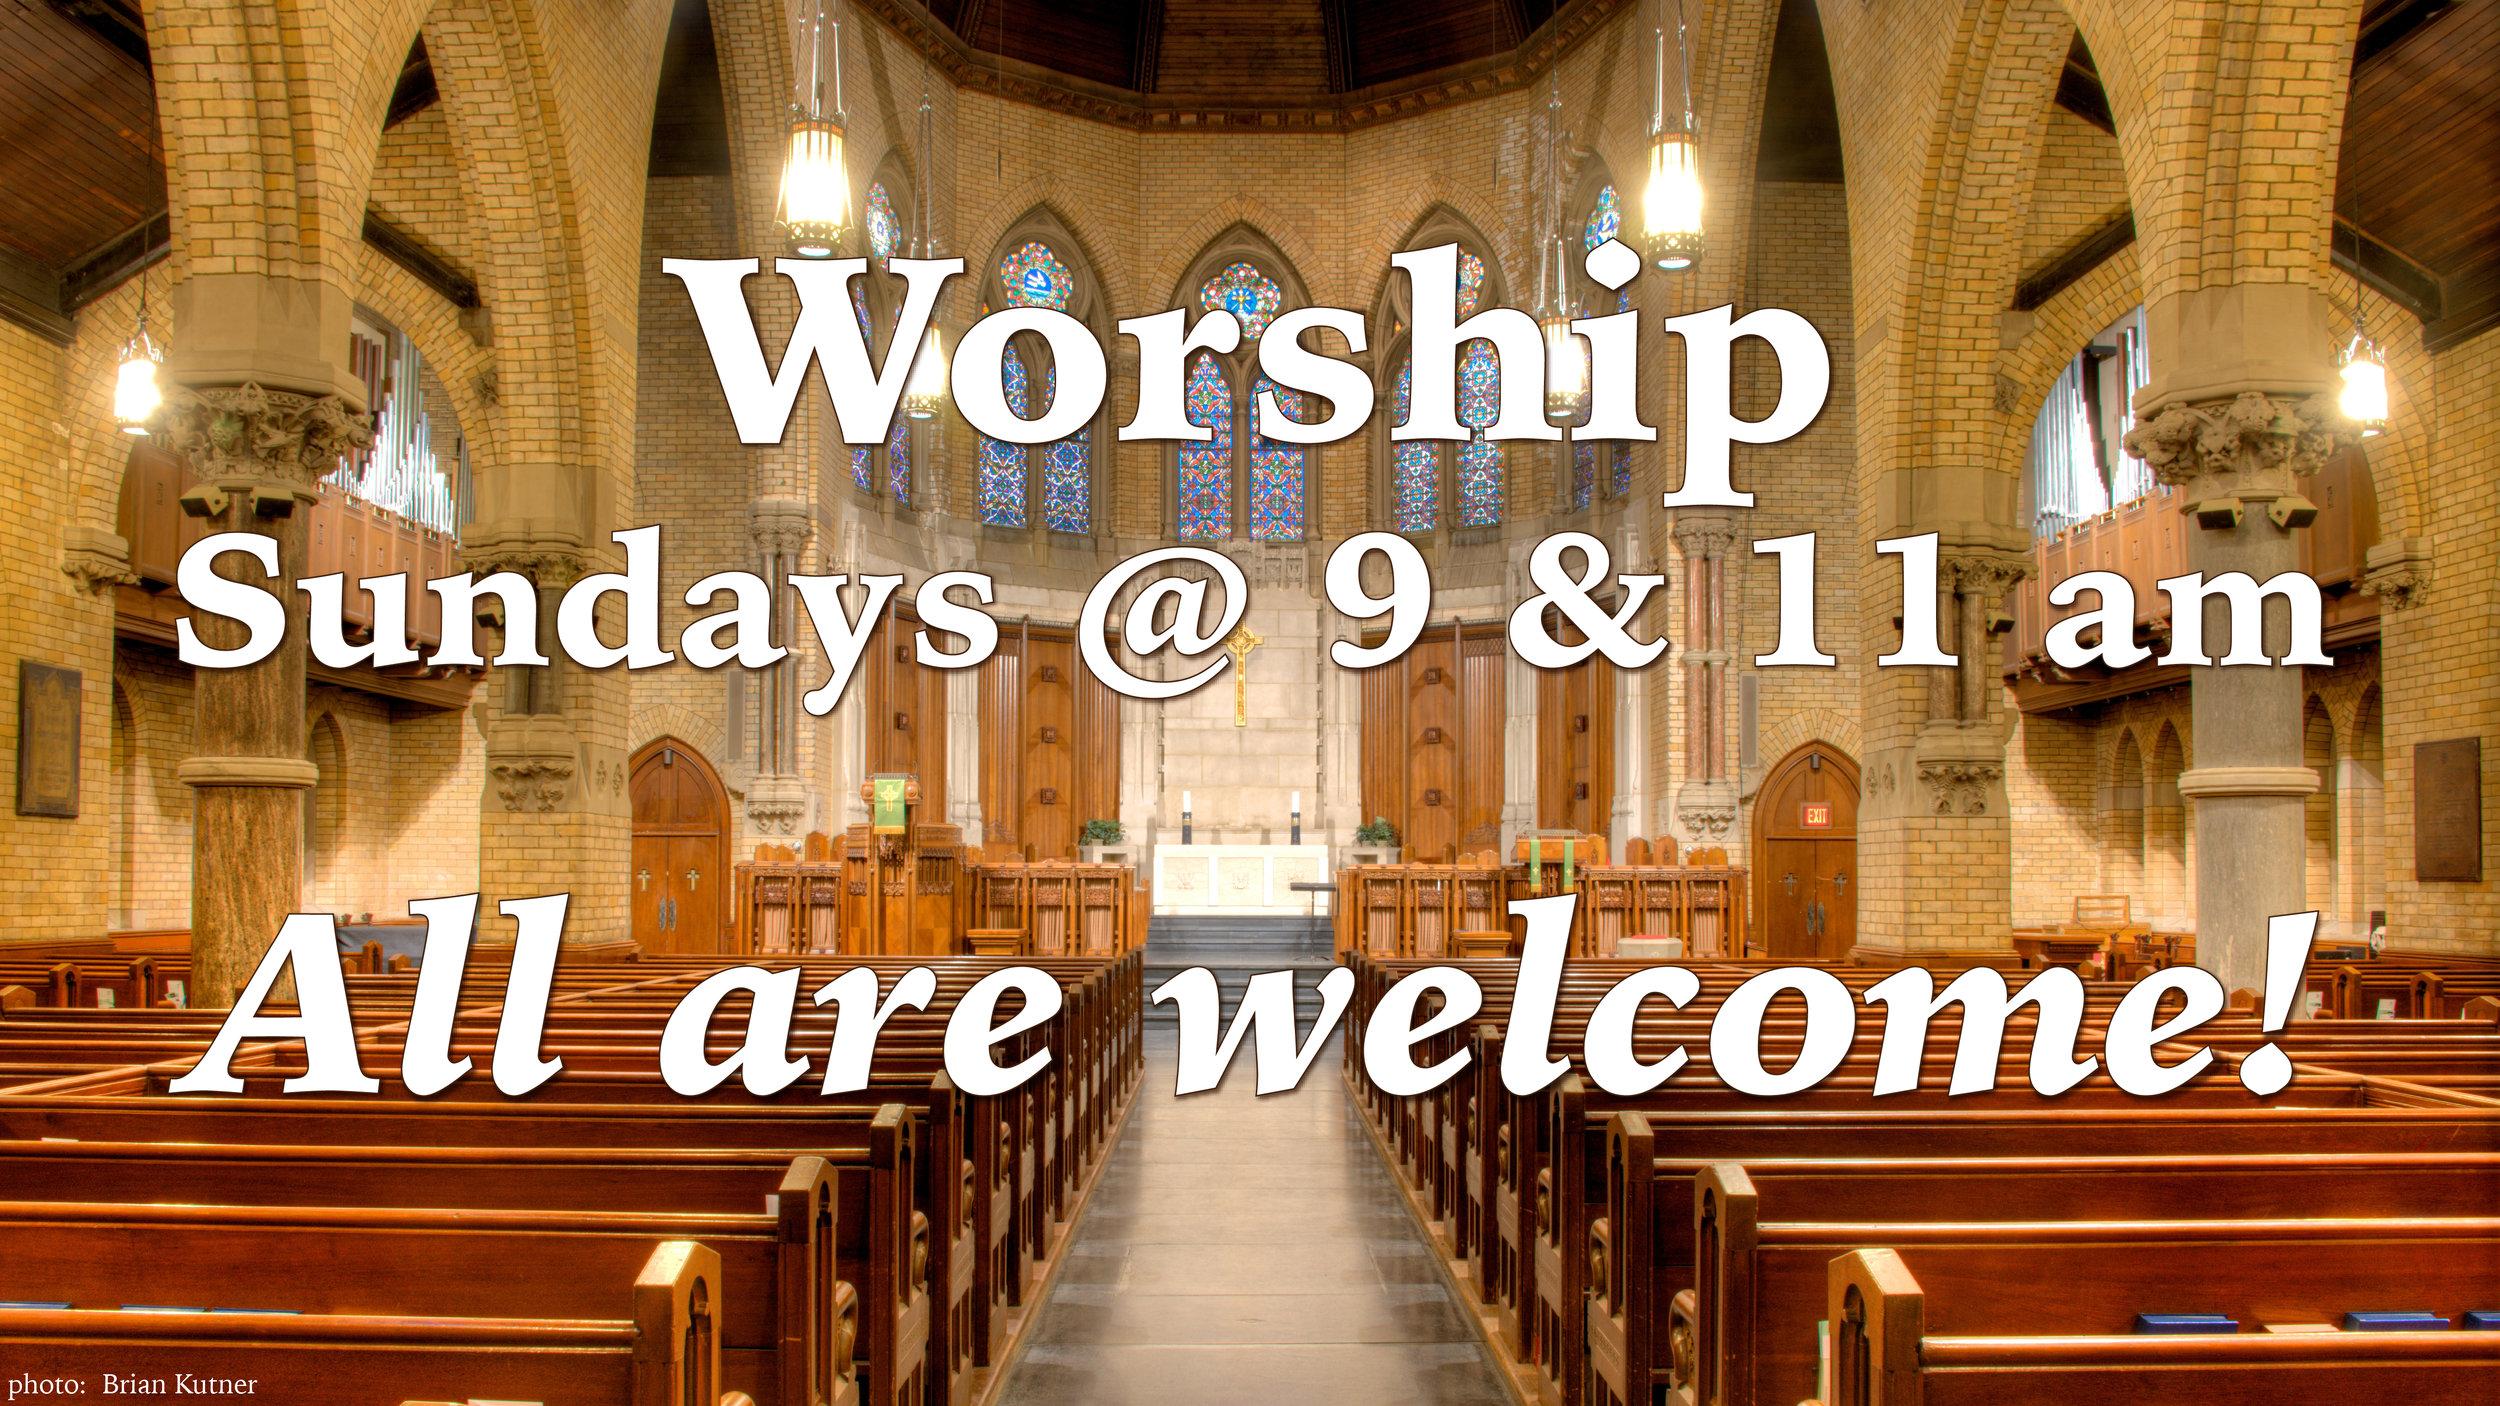 Worship1280x720.jpg